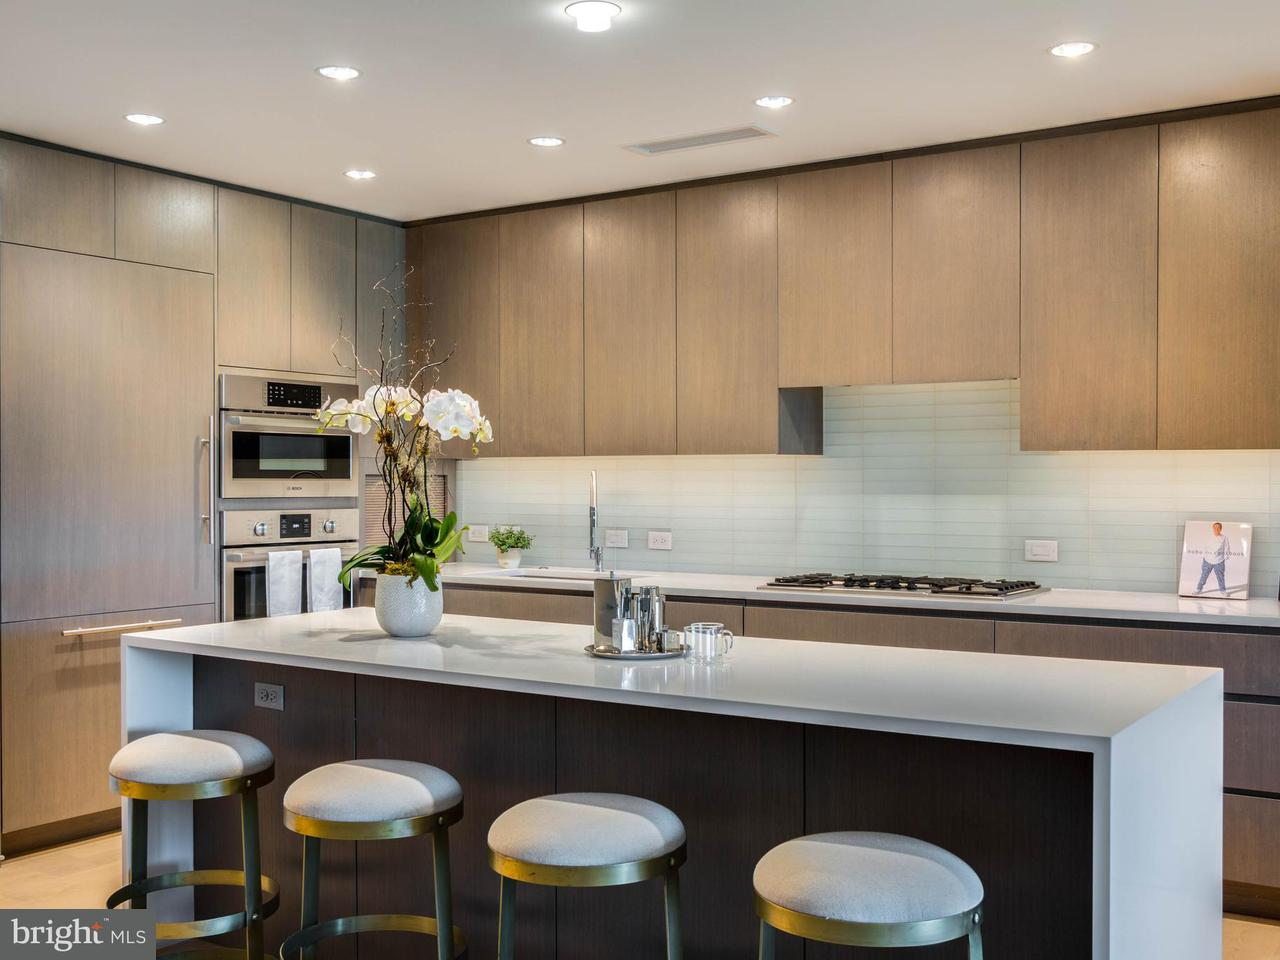 Additional photo for property listing at 2501 M St Nw #310 2501 M St Nw #310 Washington, Distrito De Columbia 20037 Estados Unidos